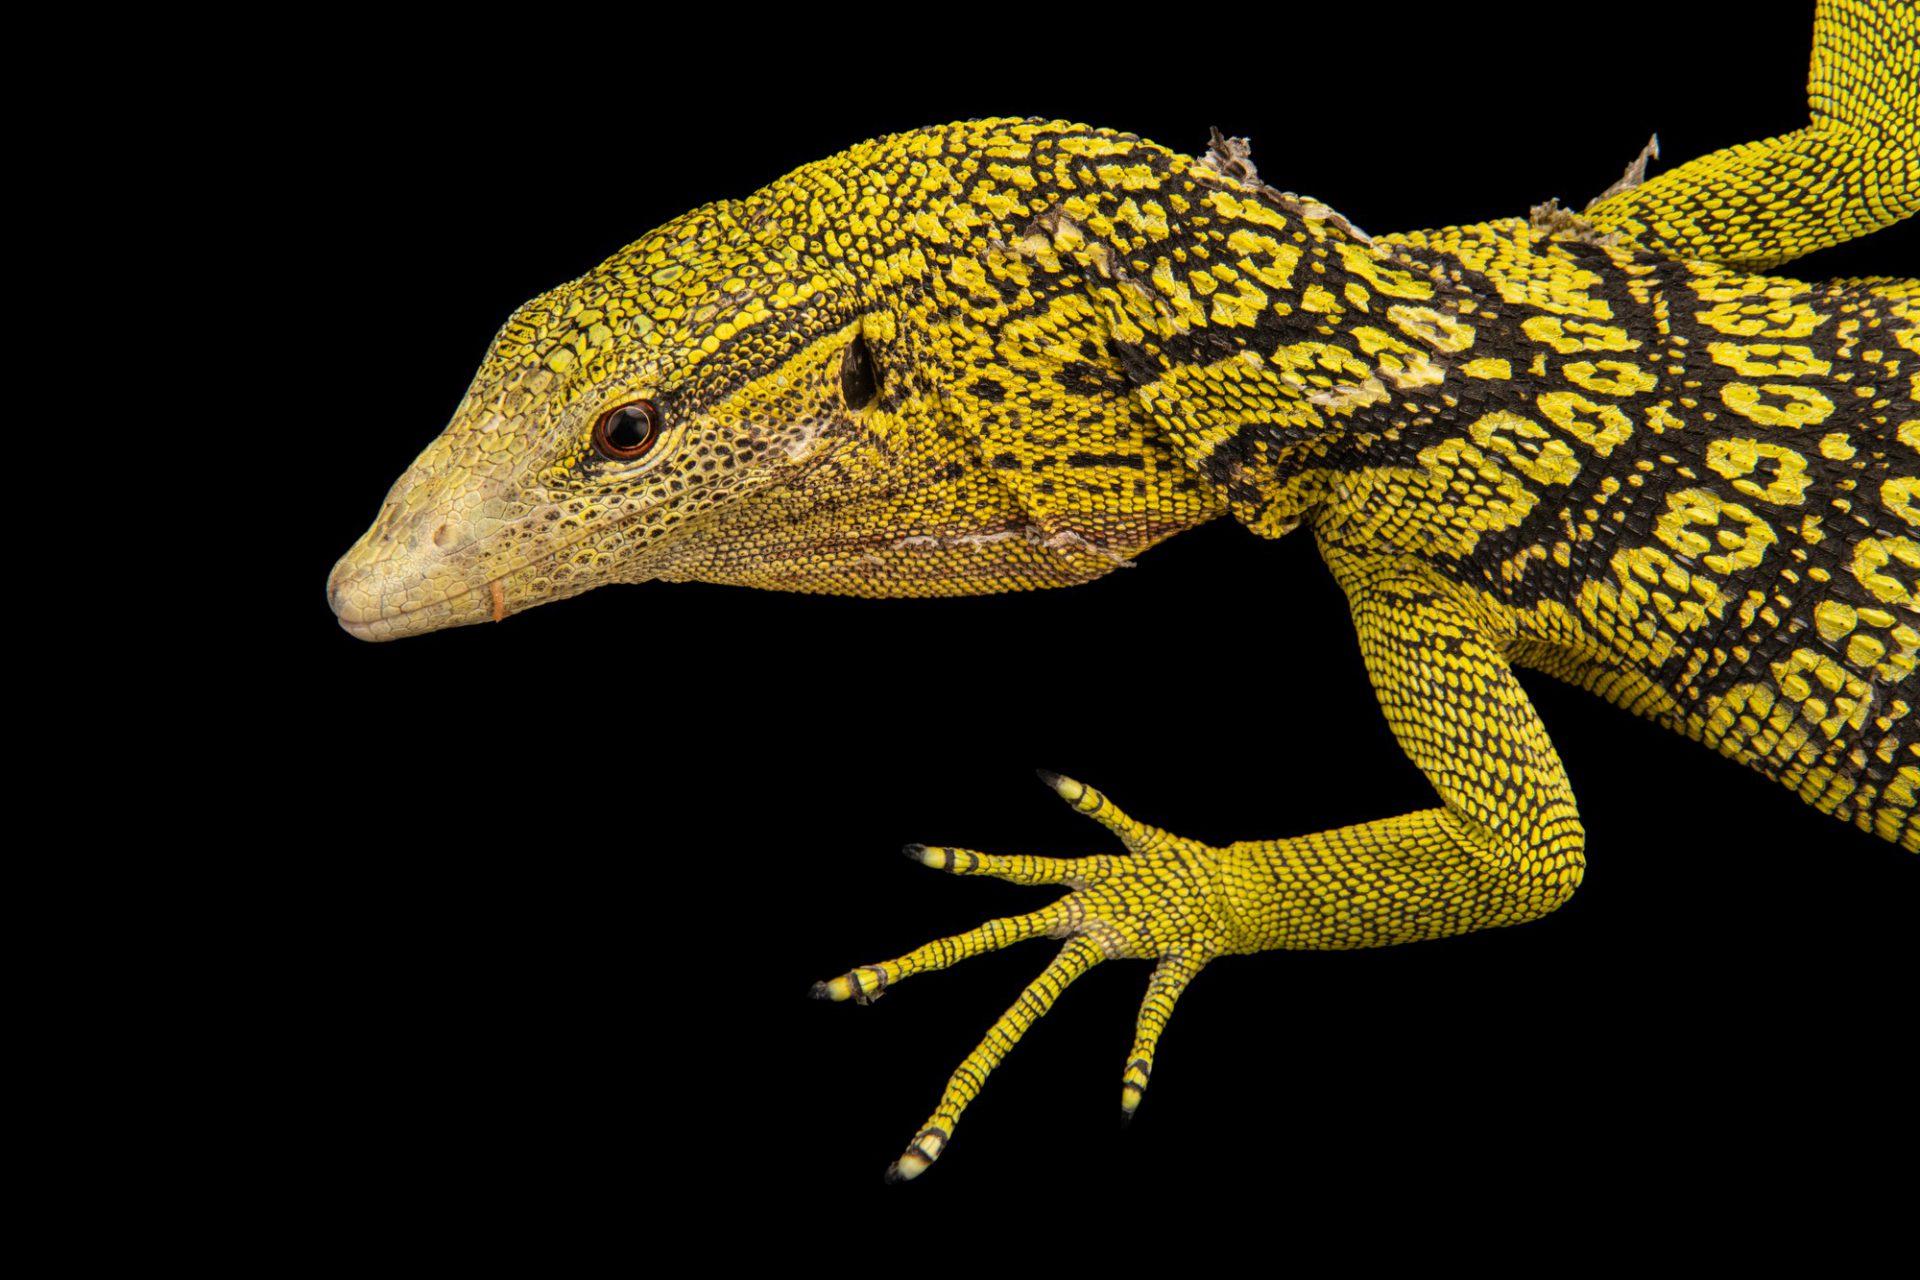 Photo: Yellow tree monitor (Varanus reisingeri) at Davao Crocodile Park.